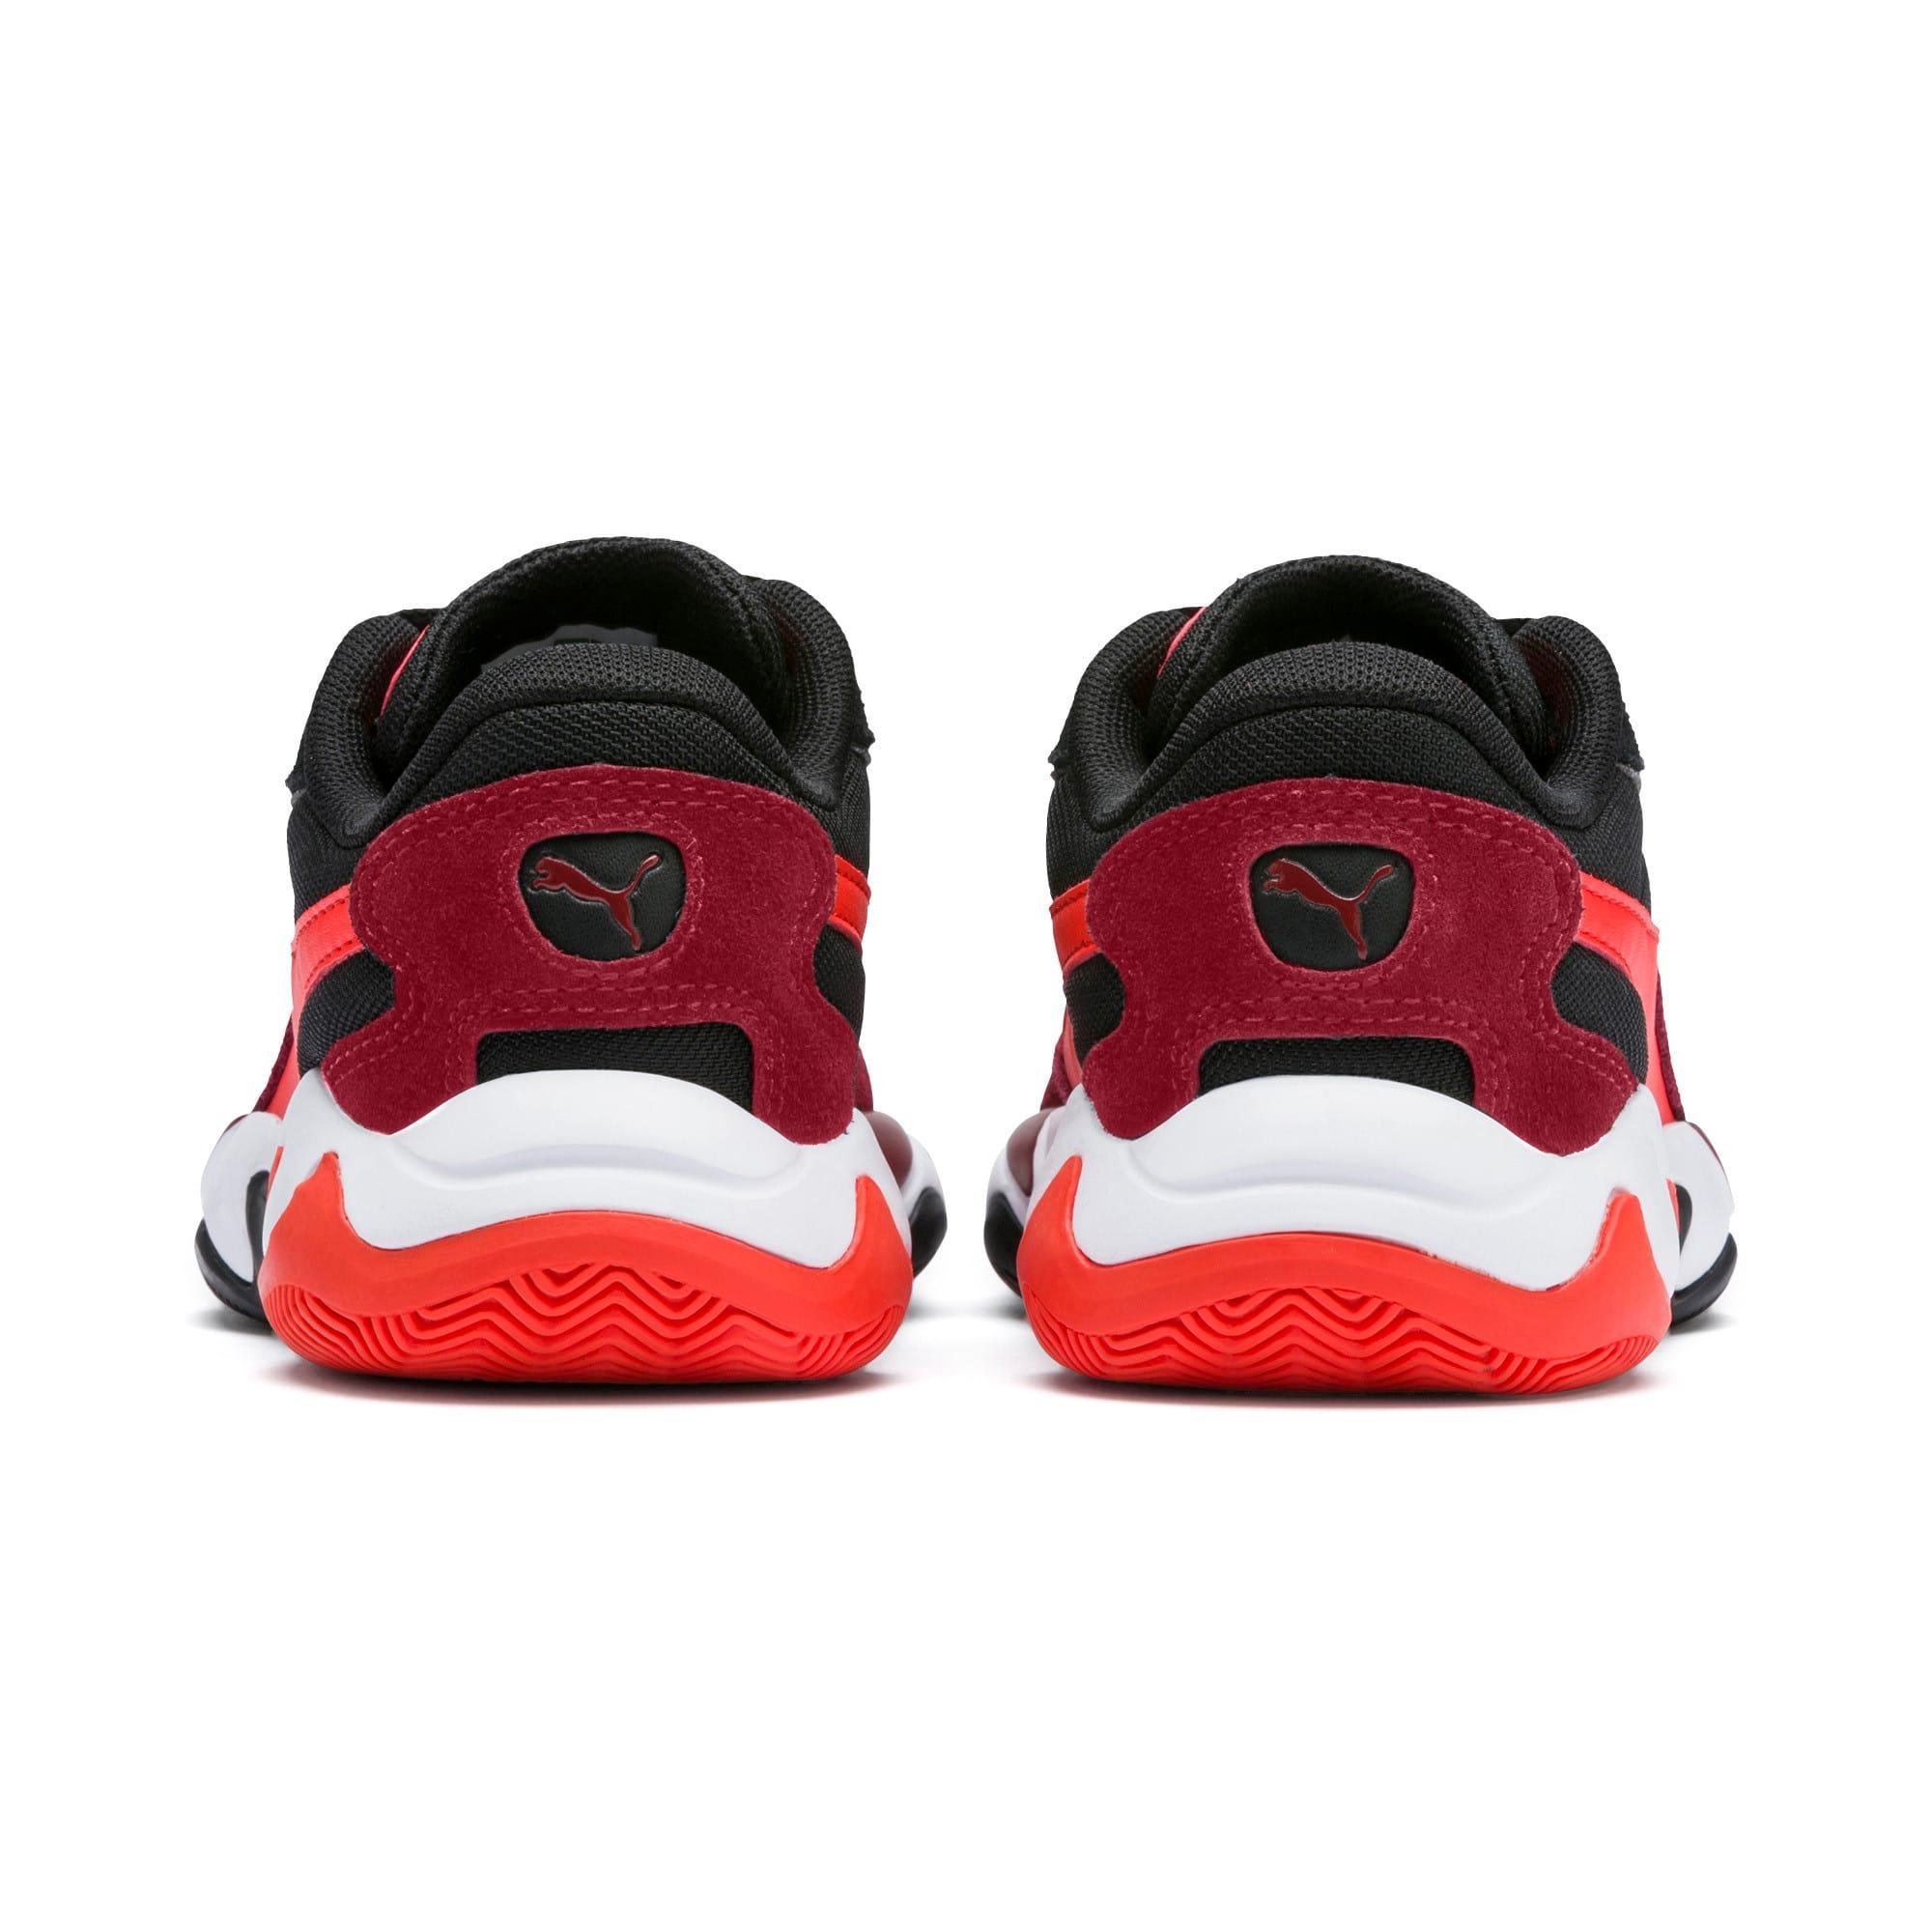 Miniatura 3 de Zapatos Storm Ray para niño pequeño, Rhubarb-Puma Black, mediano